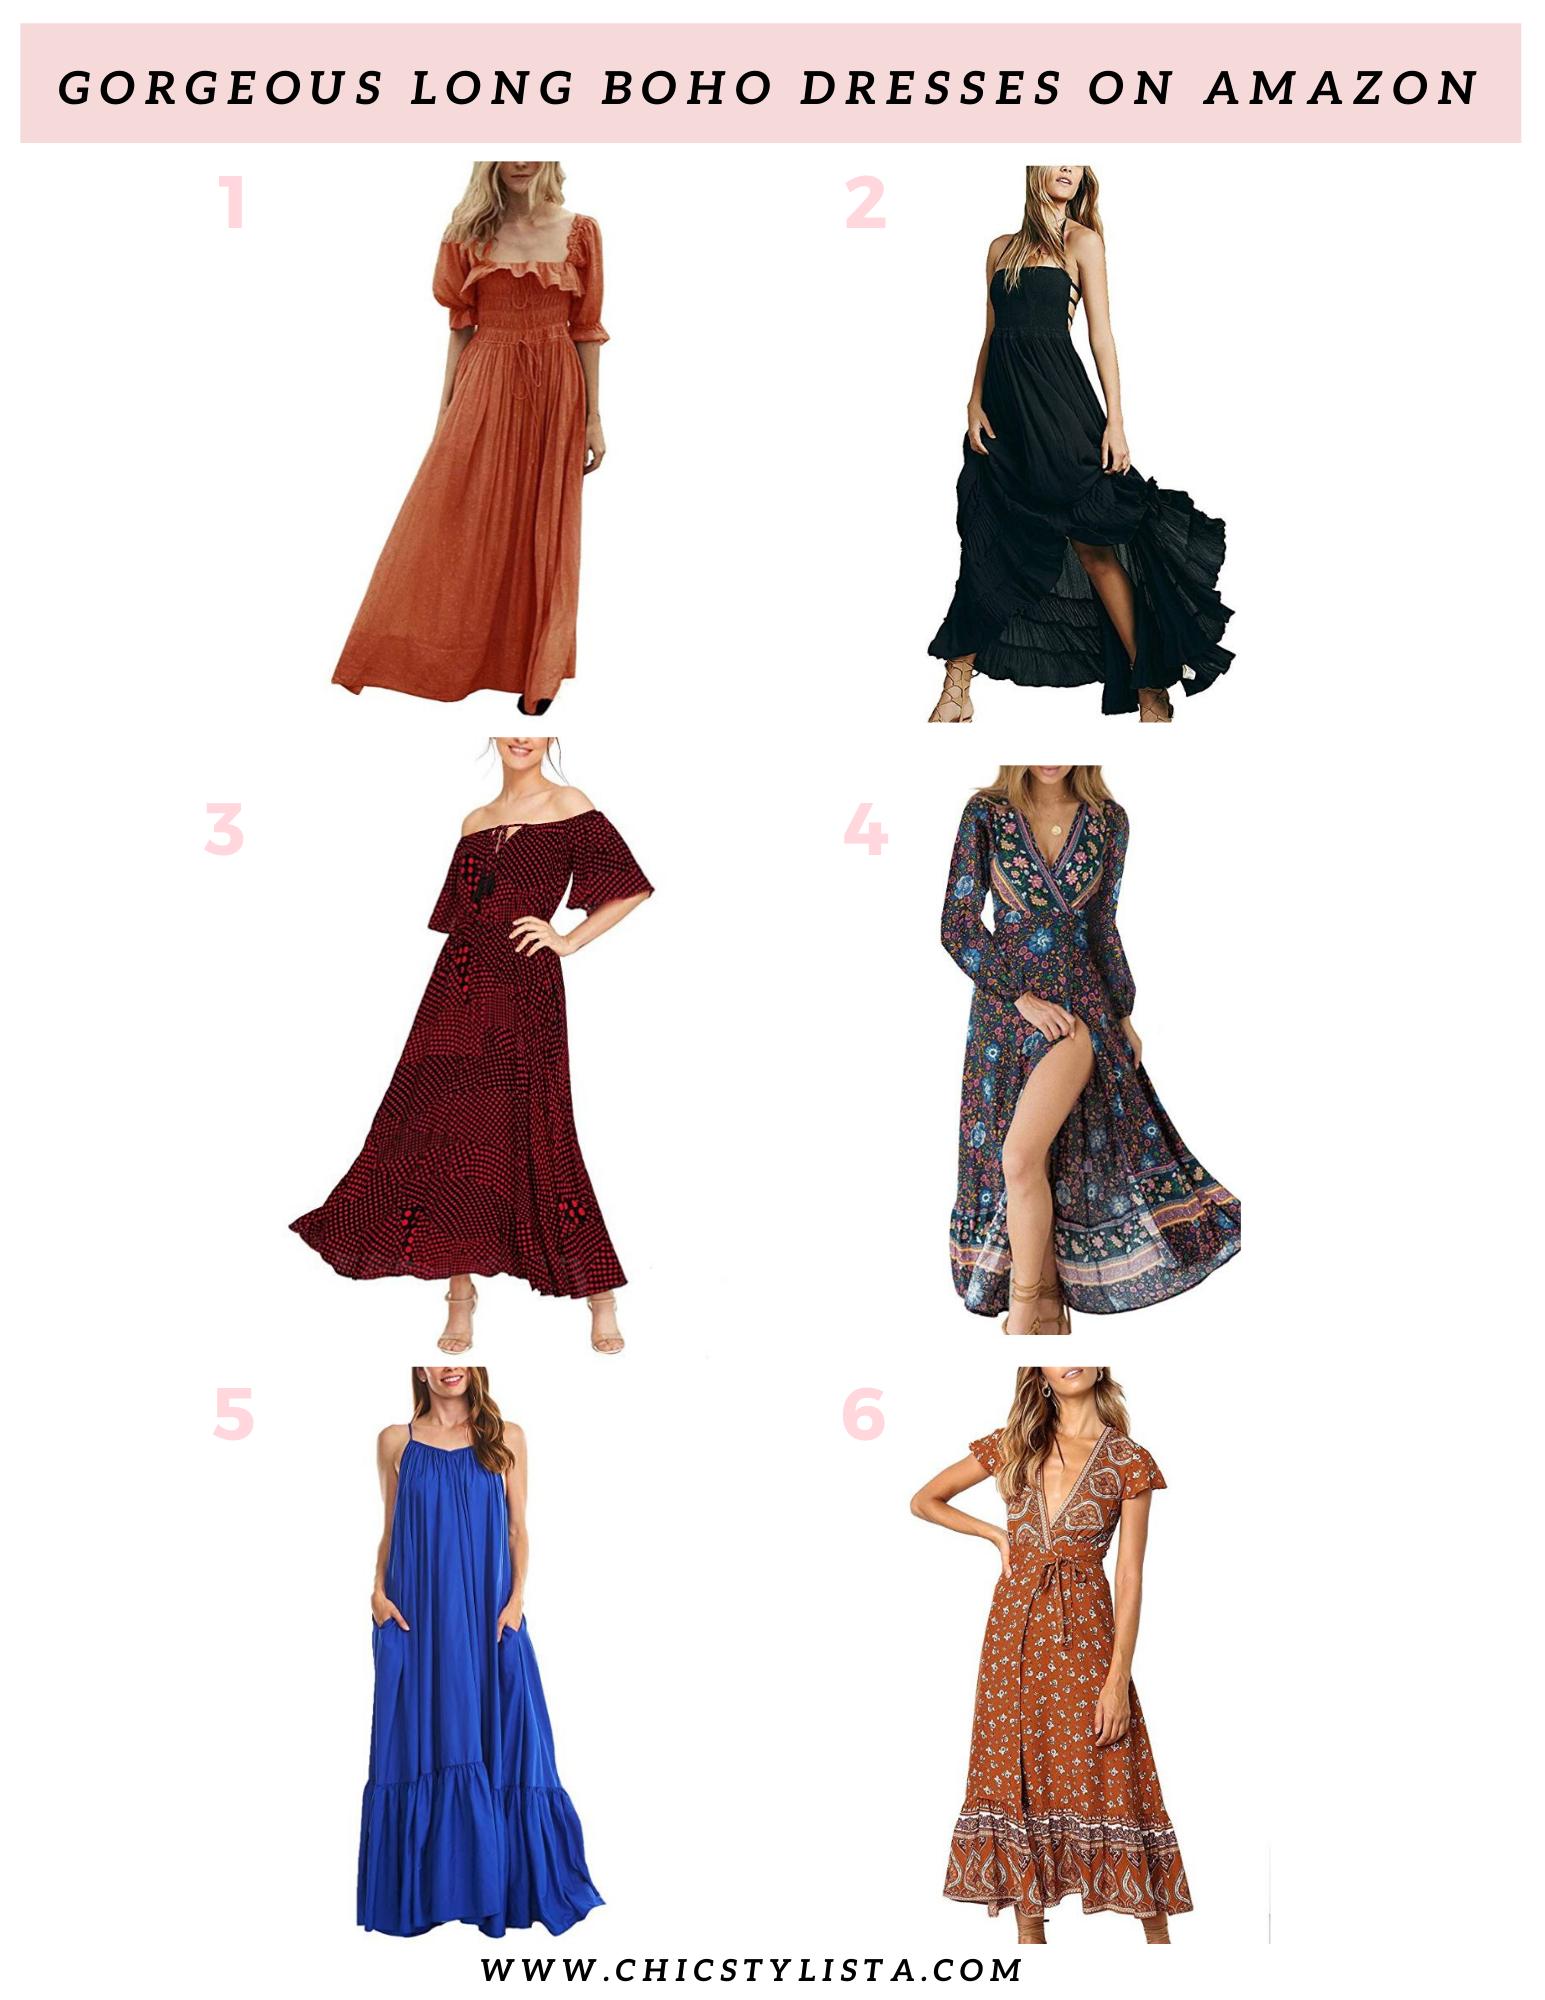 Shop Gorgeous Long Boho Dresses on Amazon Prime